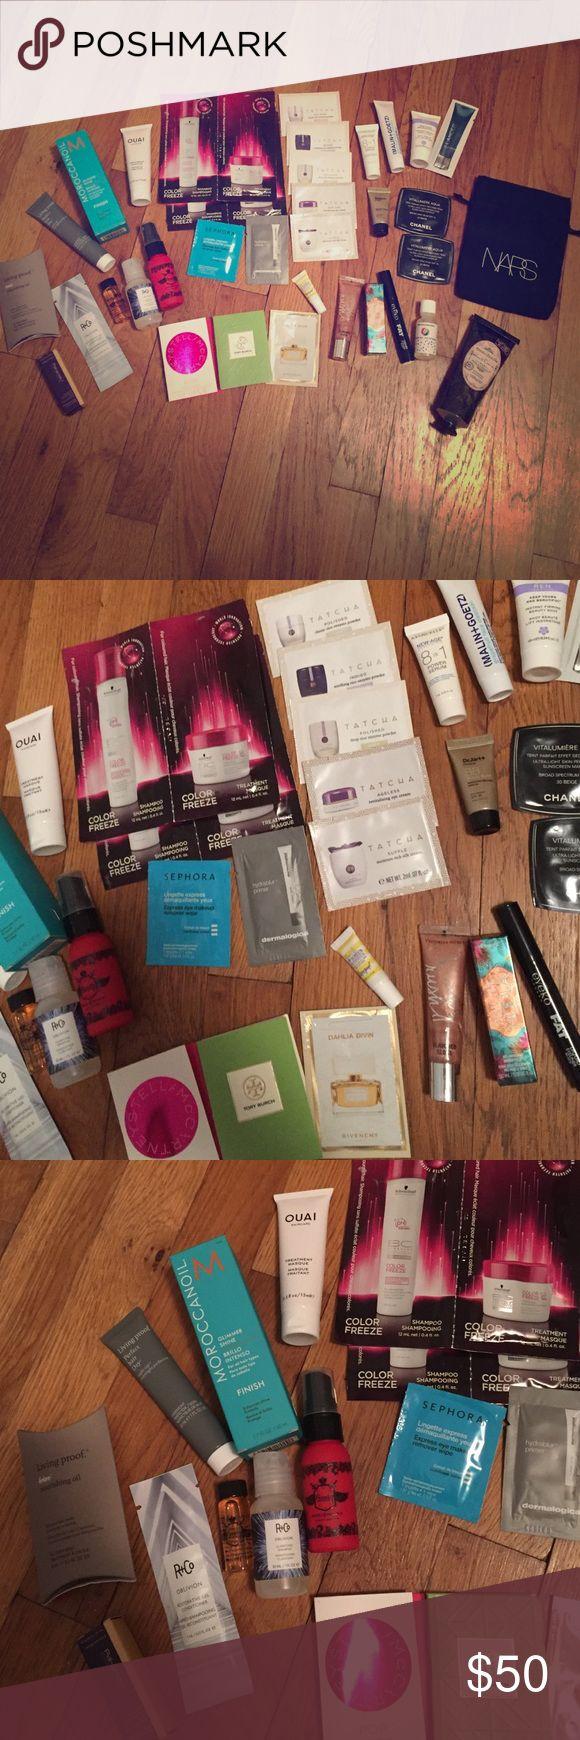 Best 10 Beauty blender cleanser ideas on Pinterest Makeup